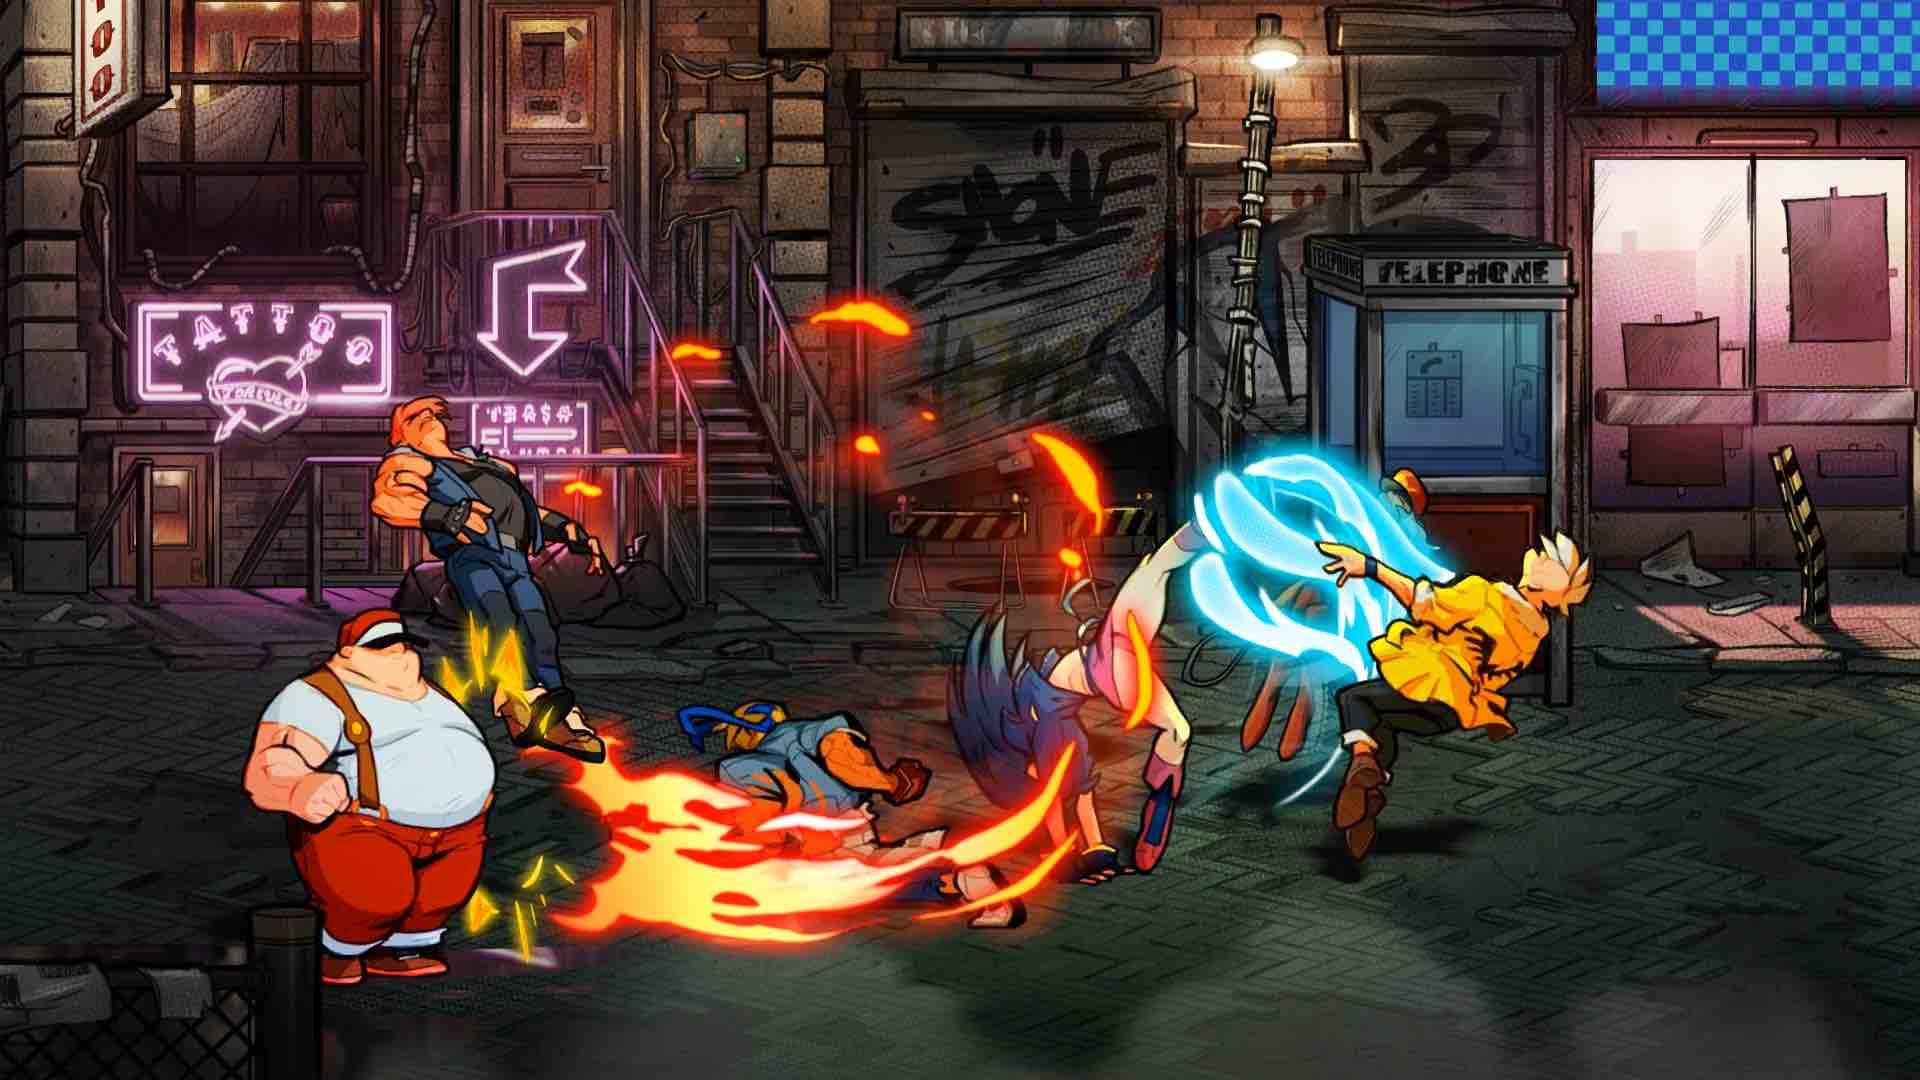 Streets Of Rage 4 Screenshot 6